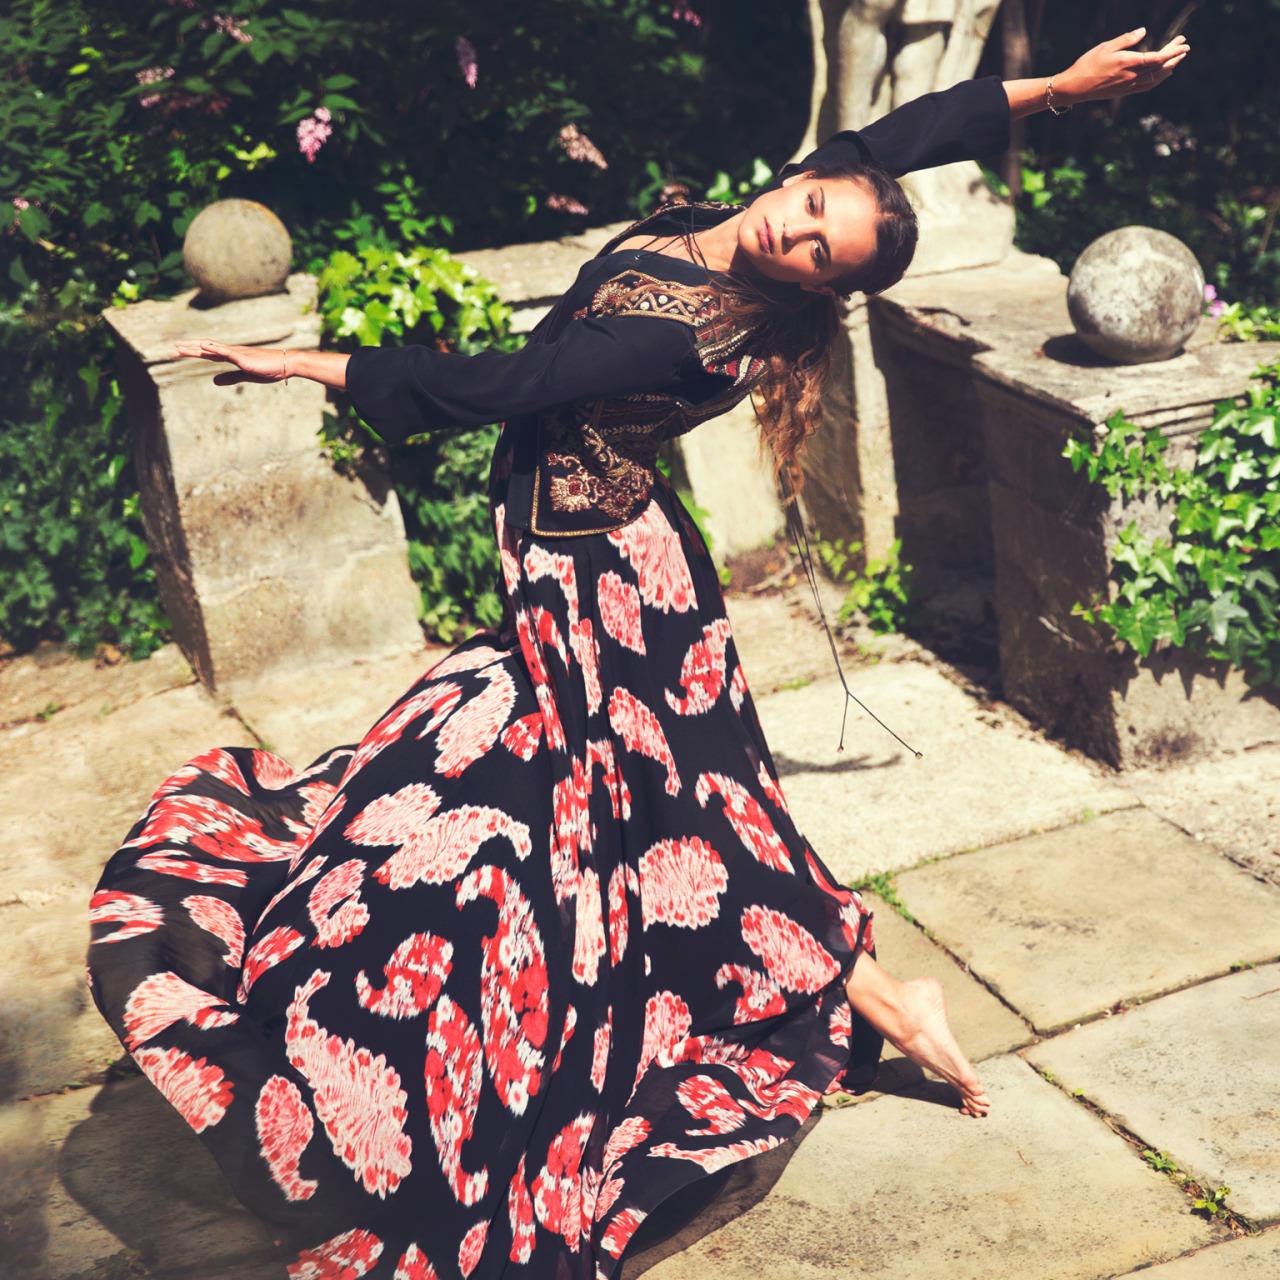 Alicia-Vikander-Ex-Machina-Man-From-UNCLE-The-Edit-Magazine-Fashion-Tom-Lorenzo-Site-TLO (Main)